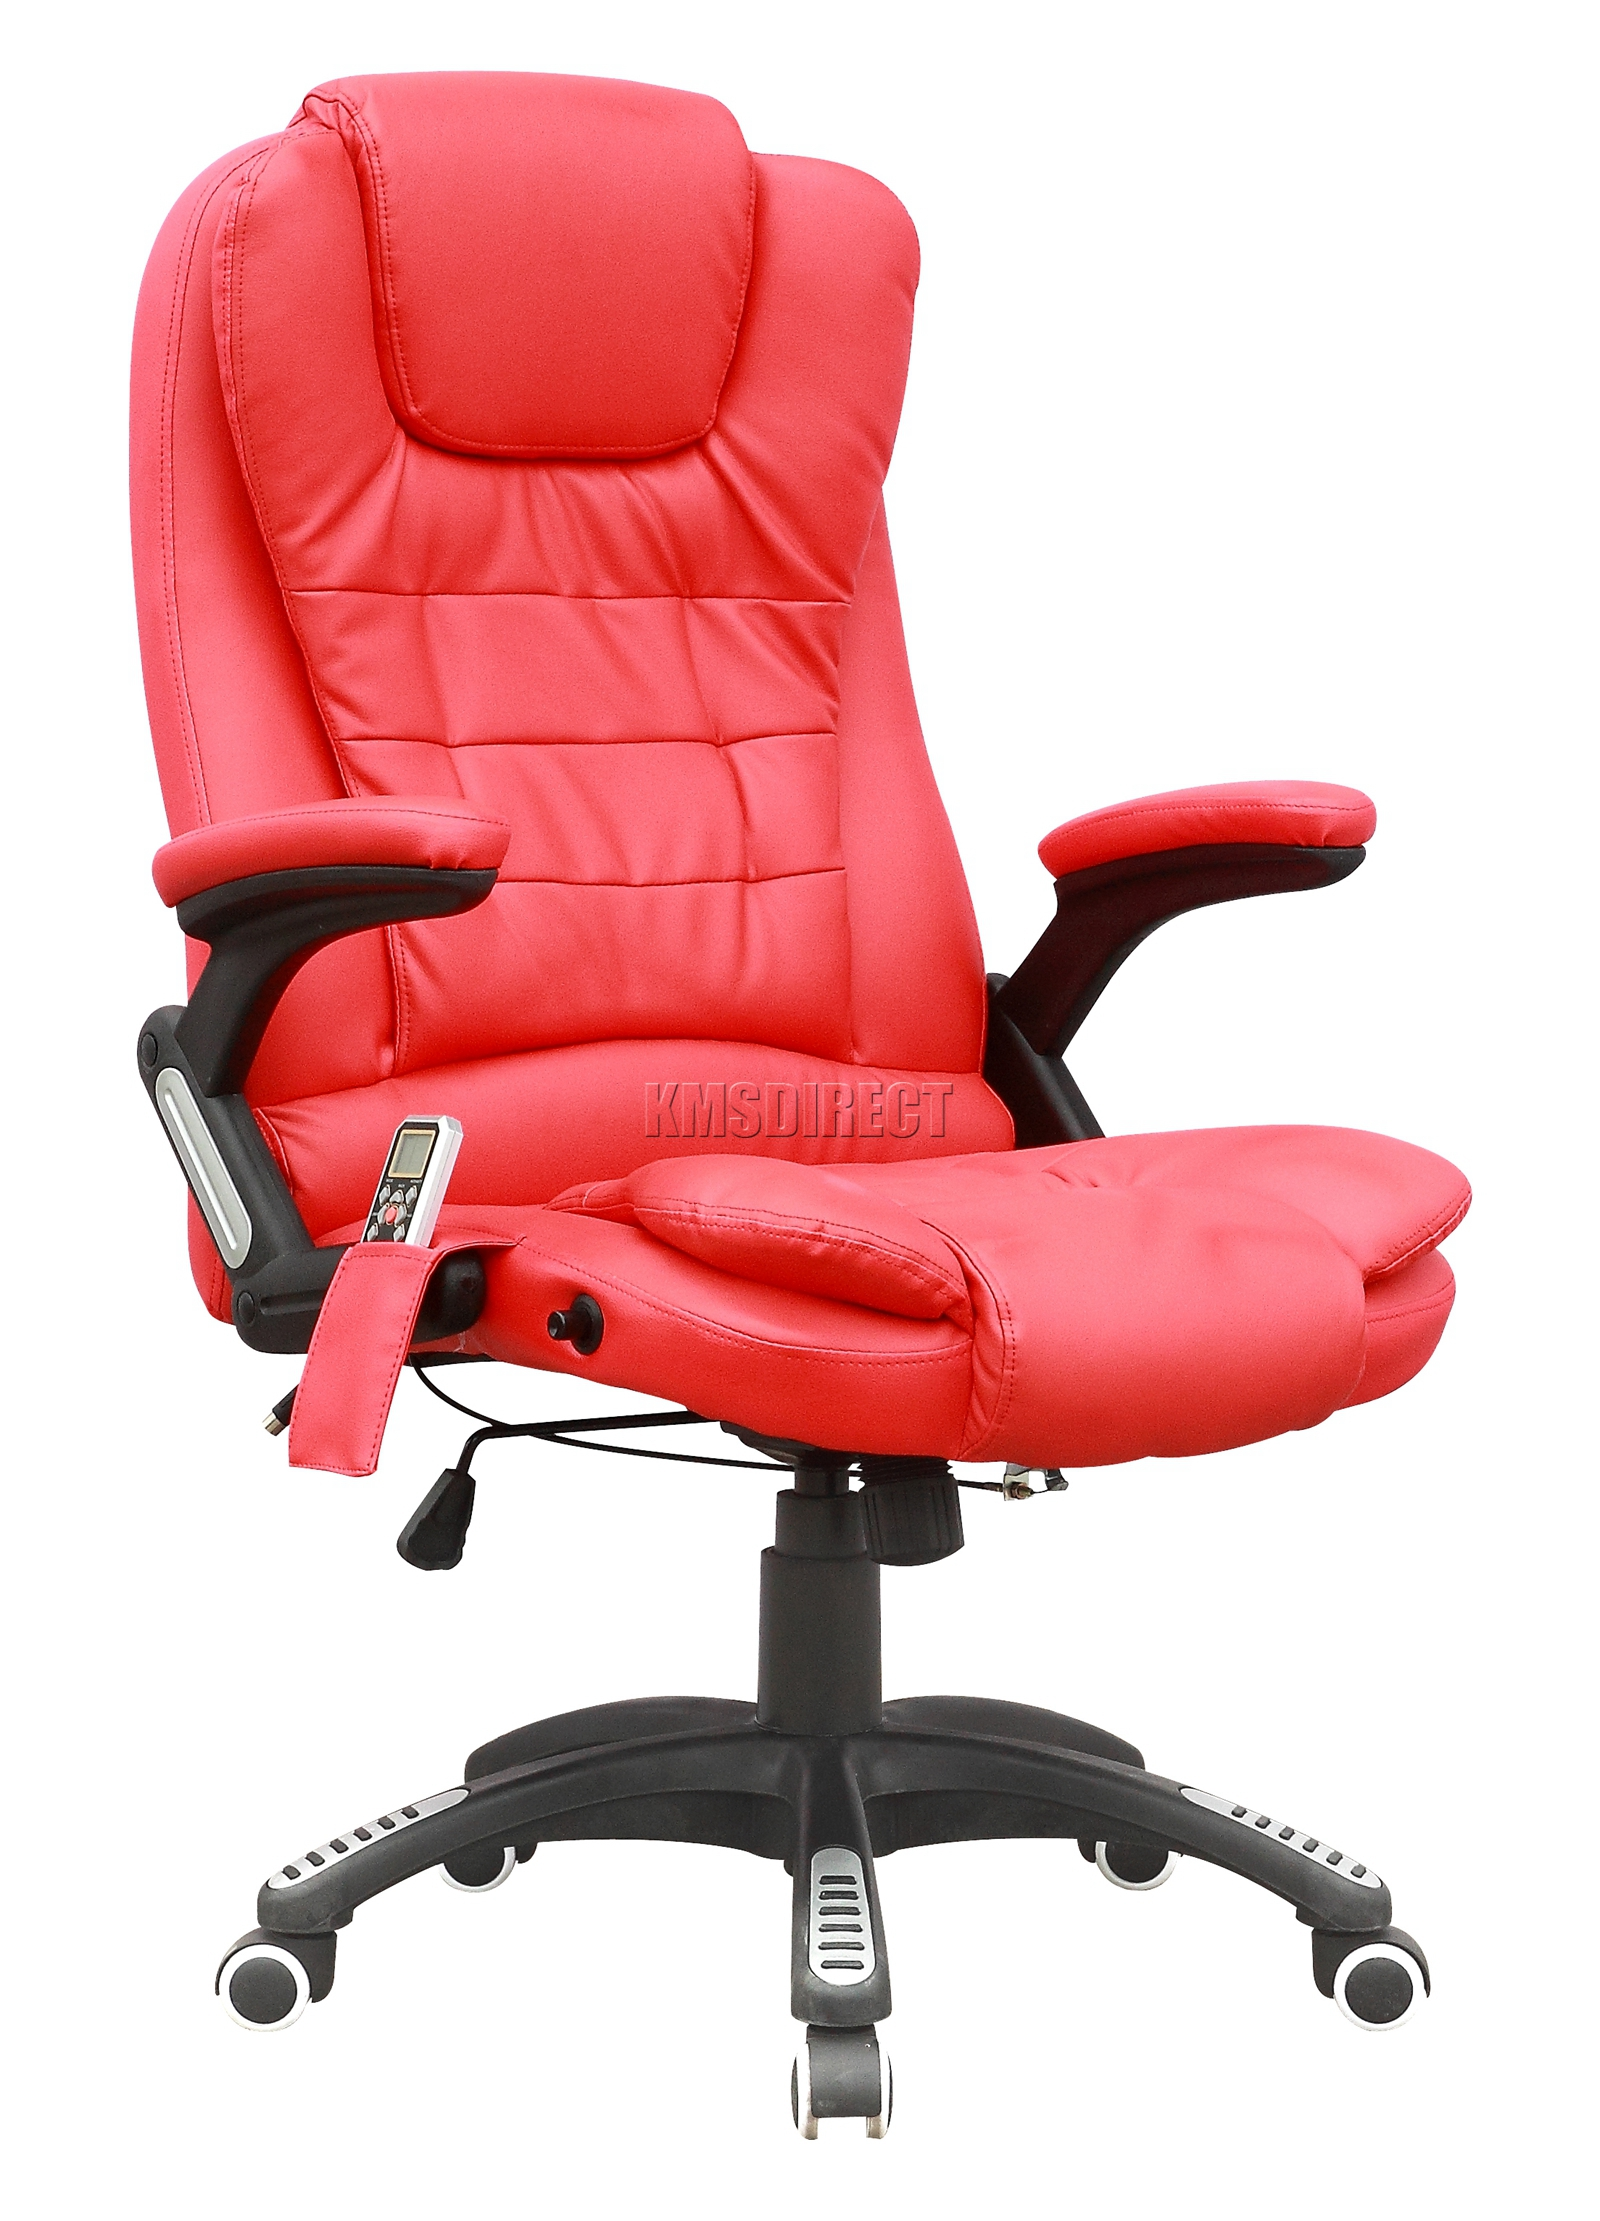 best office massage chair double papasan frame foxhunter 6 point computer luxury